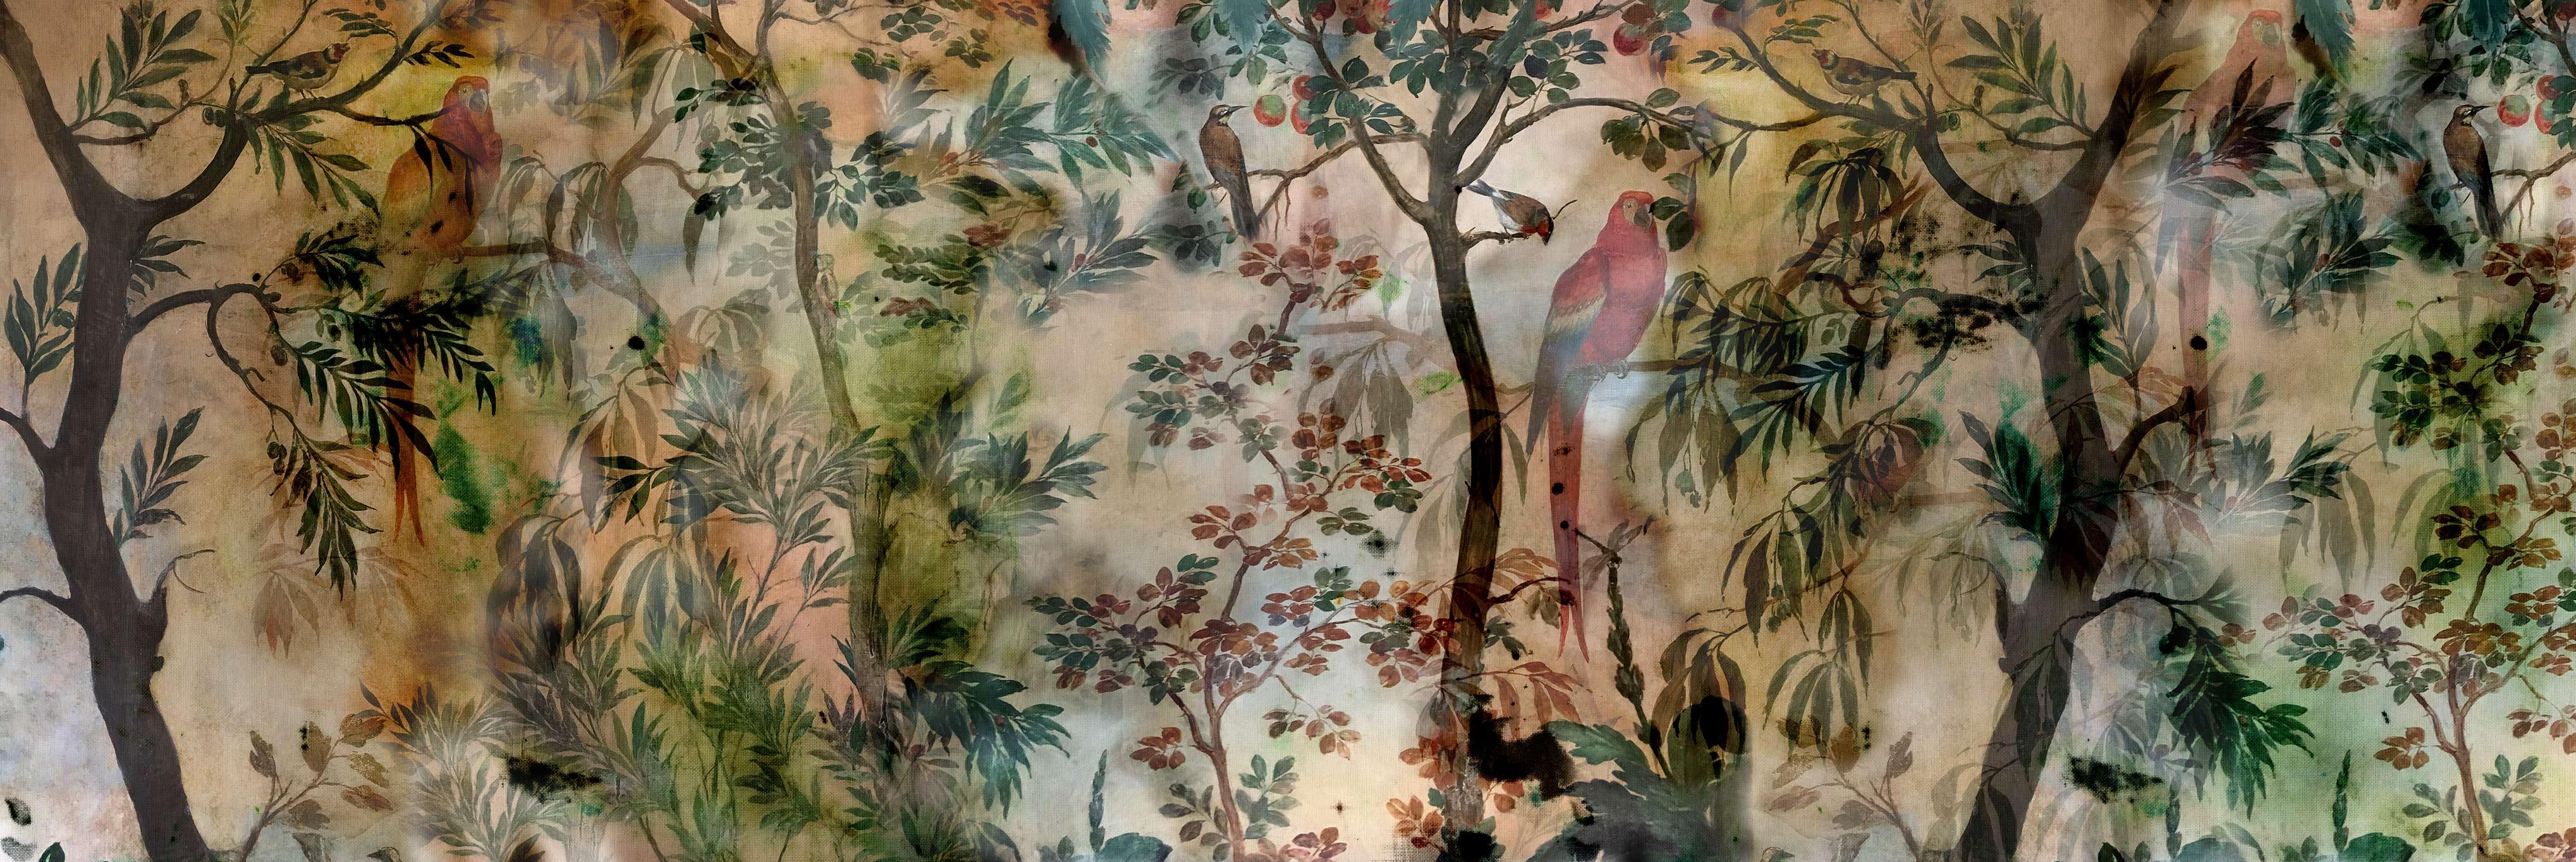 botanic Garden | Muurbloem com